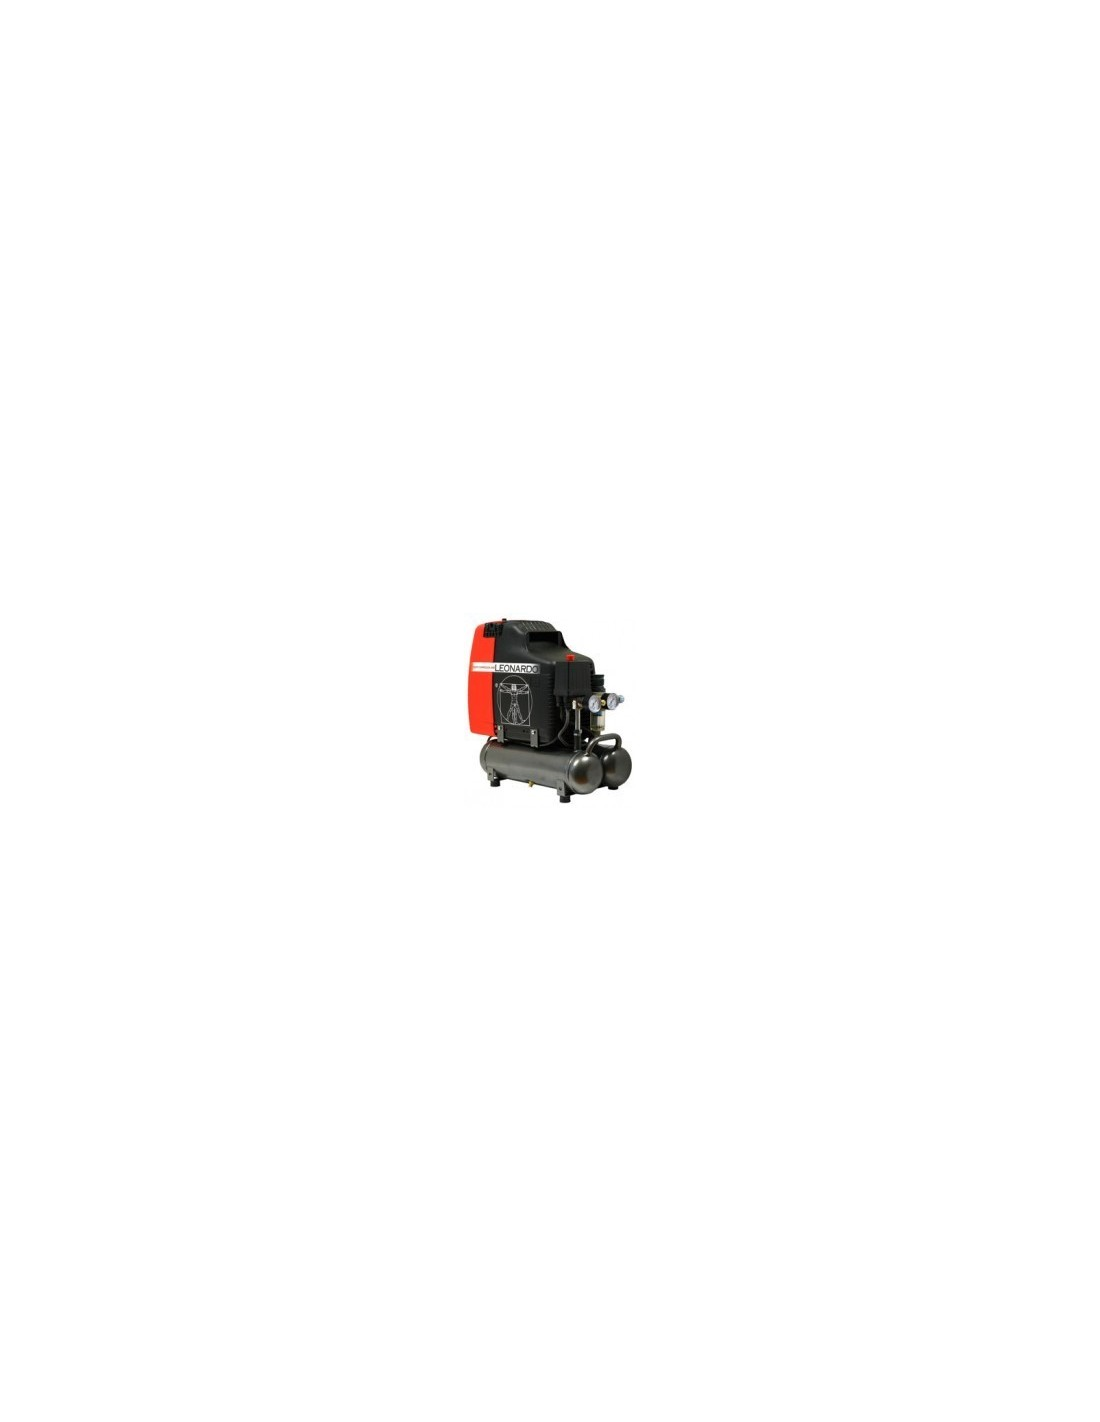 VKZ00107 - Air compressor Leonardo with accumulator tank